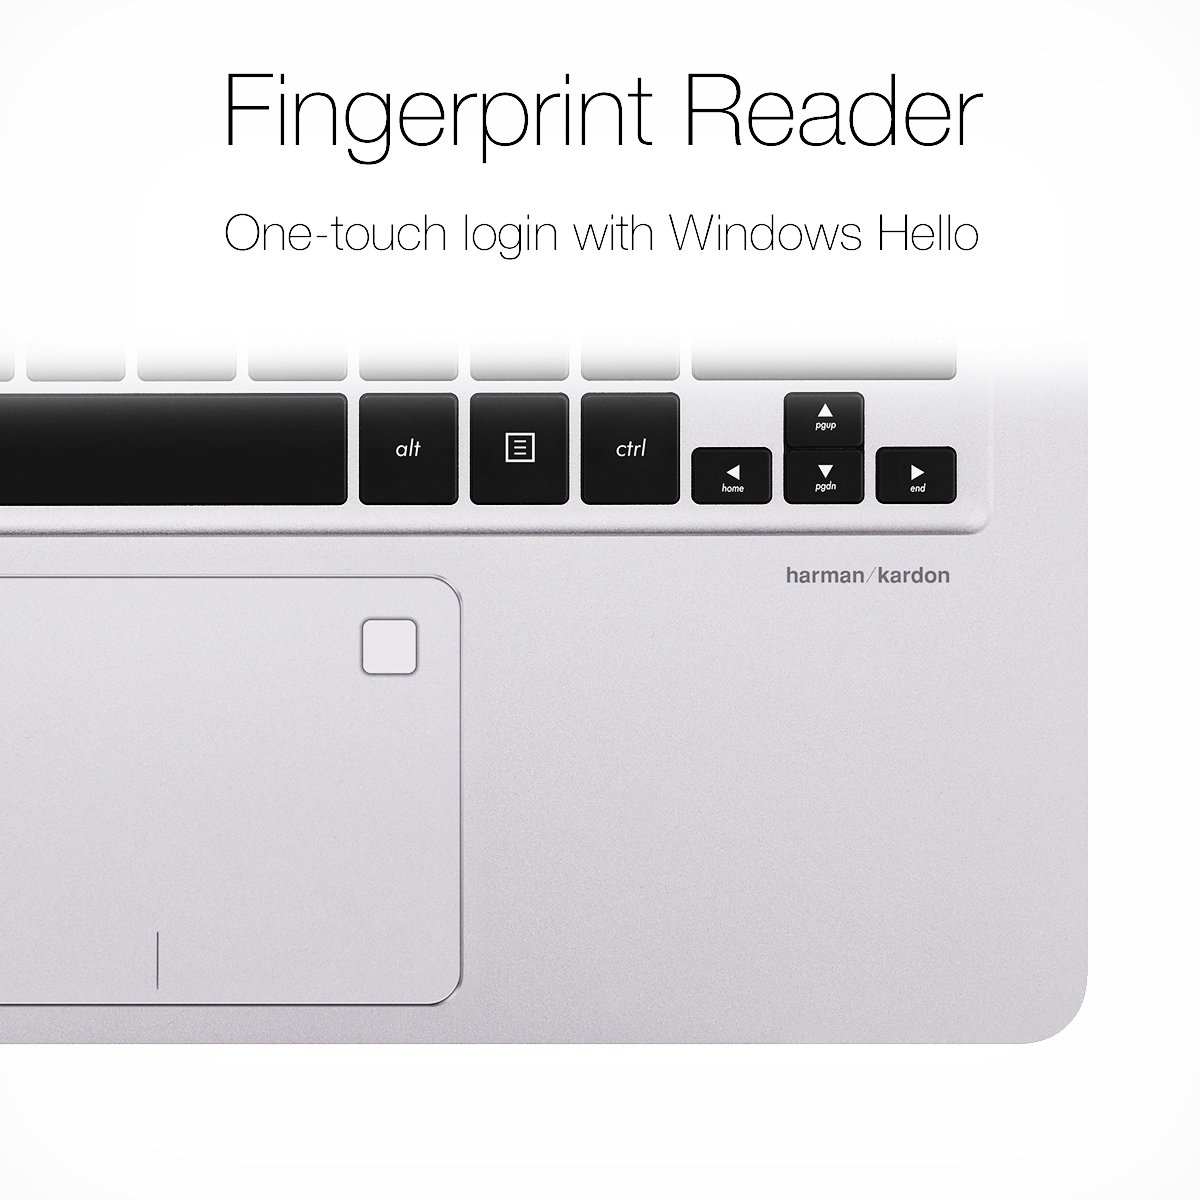 ASUS ZenBook UX330UA-AH54 13.3-inch LCD Ultra-Slim Laptop (Core i5 Processor, 8GB DDR3, 256GB SSD, Windows 10) w/ Harman Kardon Audio, Backlit keyboard, Fingerprint Reader by Asus (Image #7)